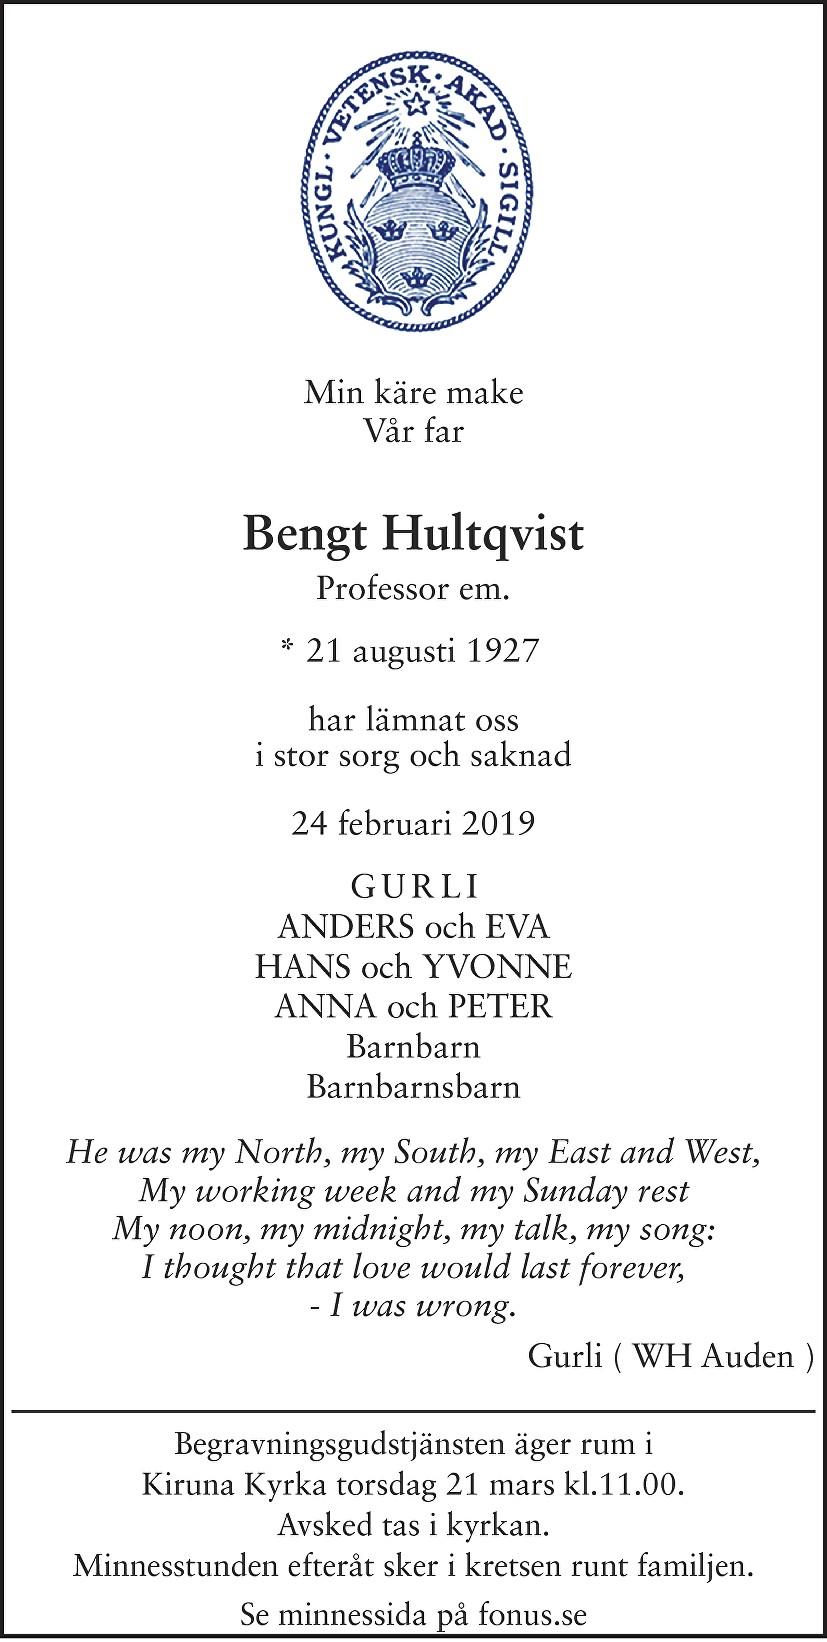 Bengt Hultqvist Death notice